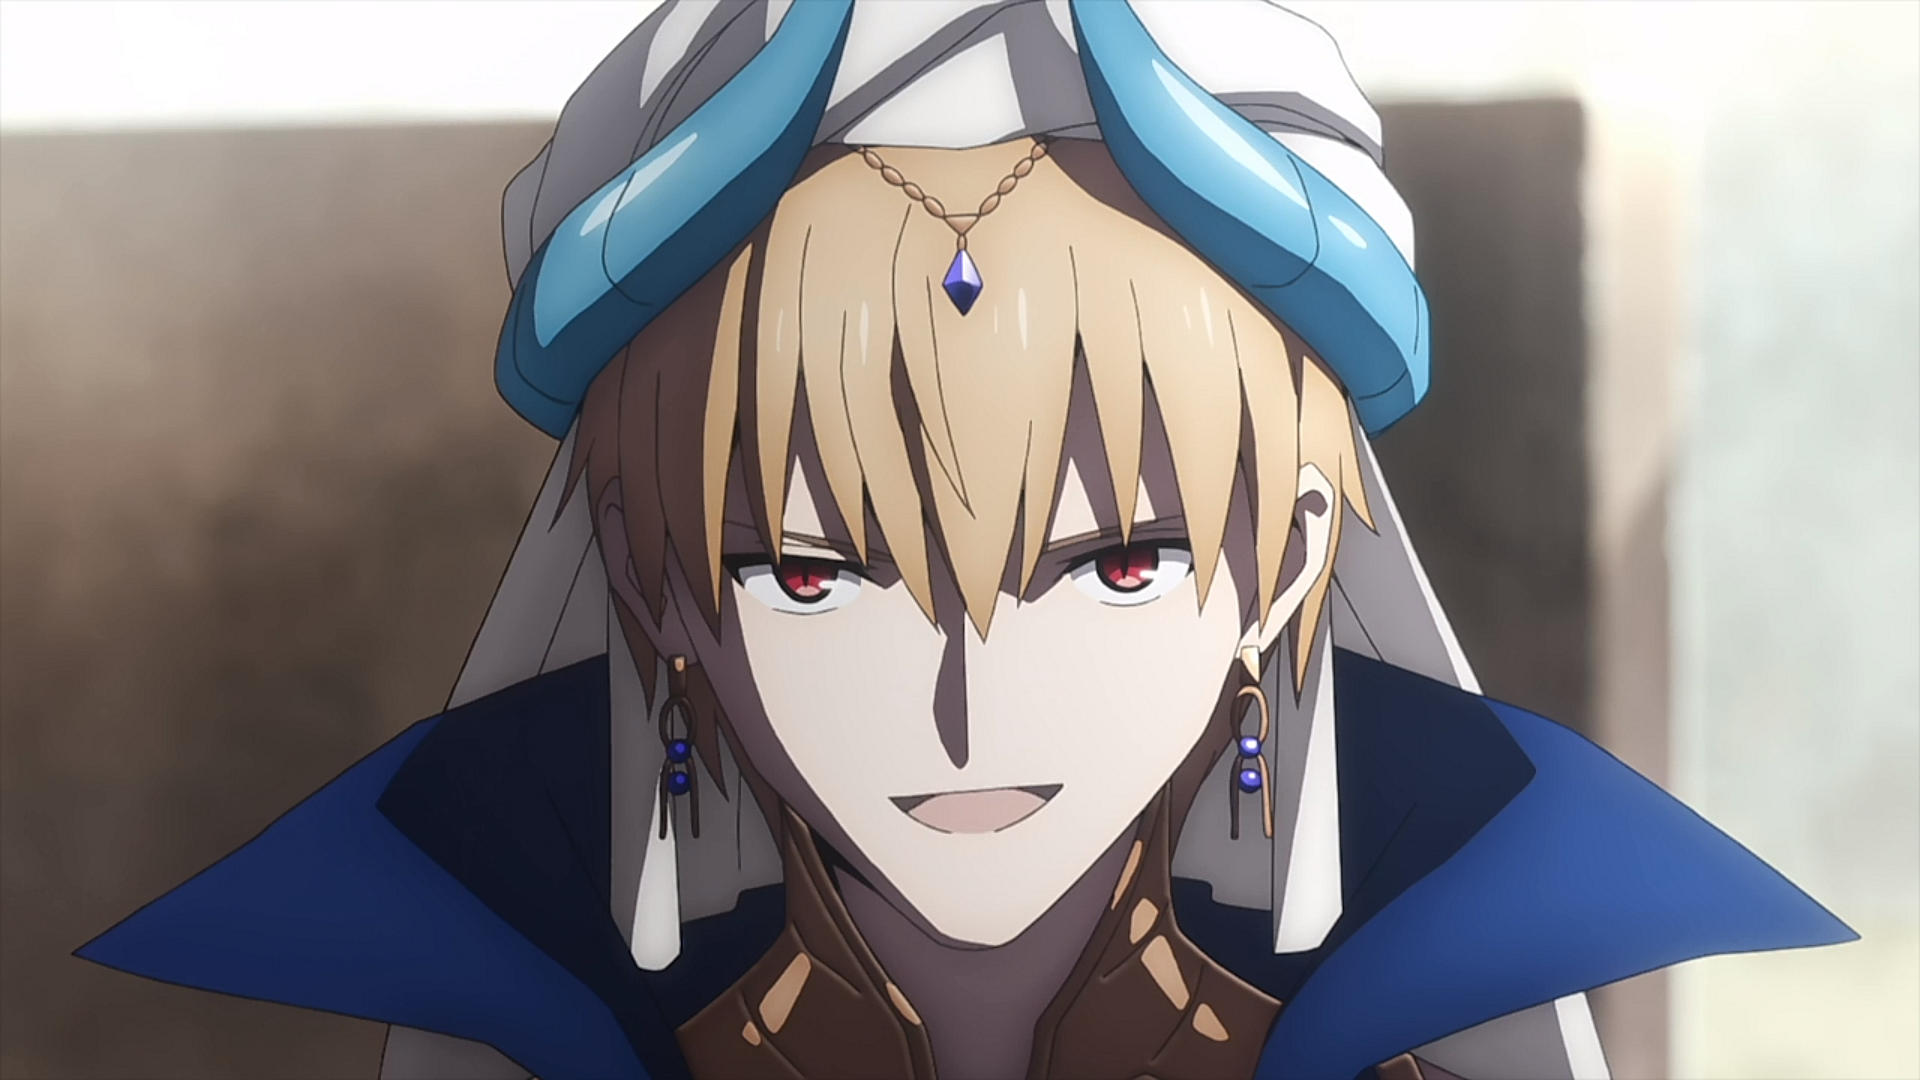 Fate Grand Order 絶対魔獣戦線バビロニア 第5話 ギルガメッシュ紀行 感想 作品情報 Hi アニ